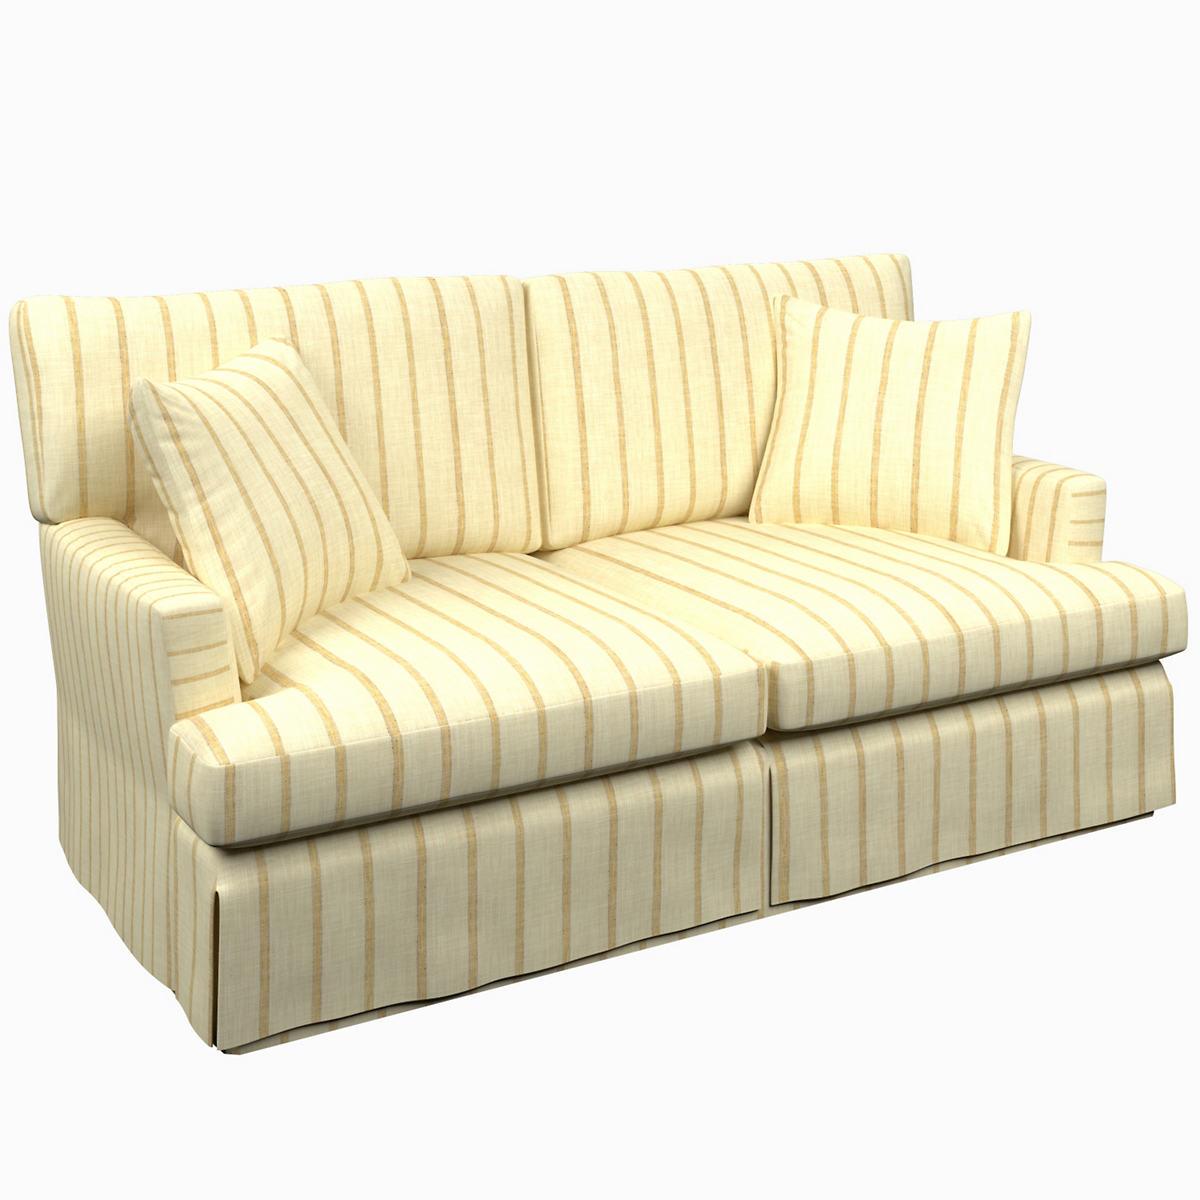 Glendale Stripe Gold/Natural Saybrook 2 Seater Sofa